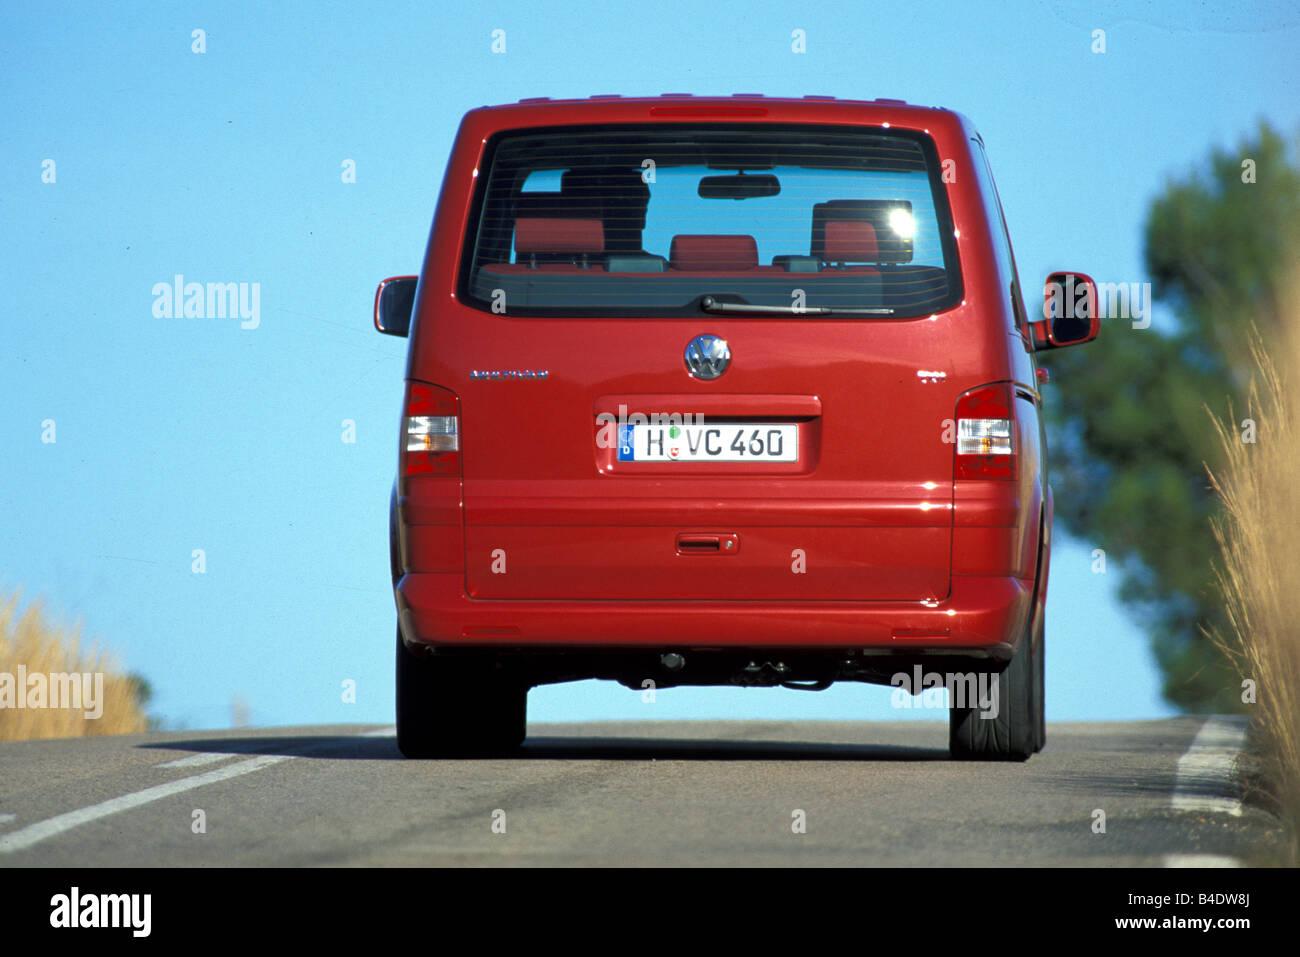 Car, VW Volkswagen Multivan T5 2.5 TDI, Van, model year 2003-, red, driving, diagonal from the back, rear view, - Stock Image